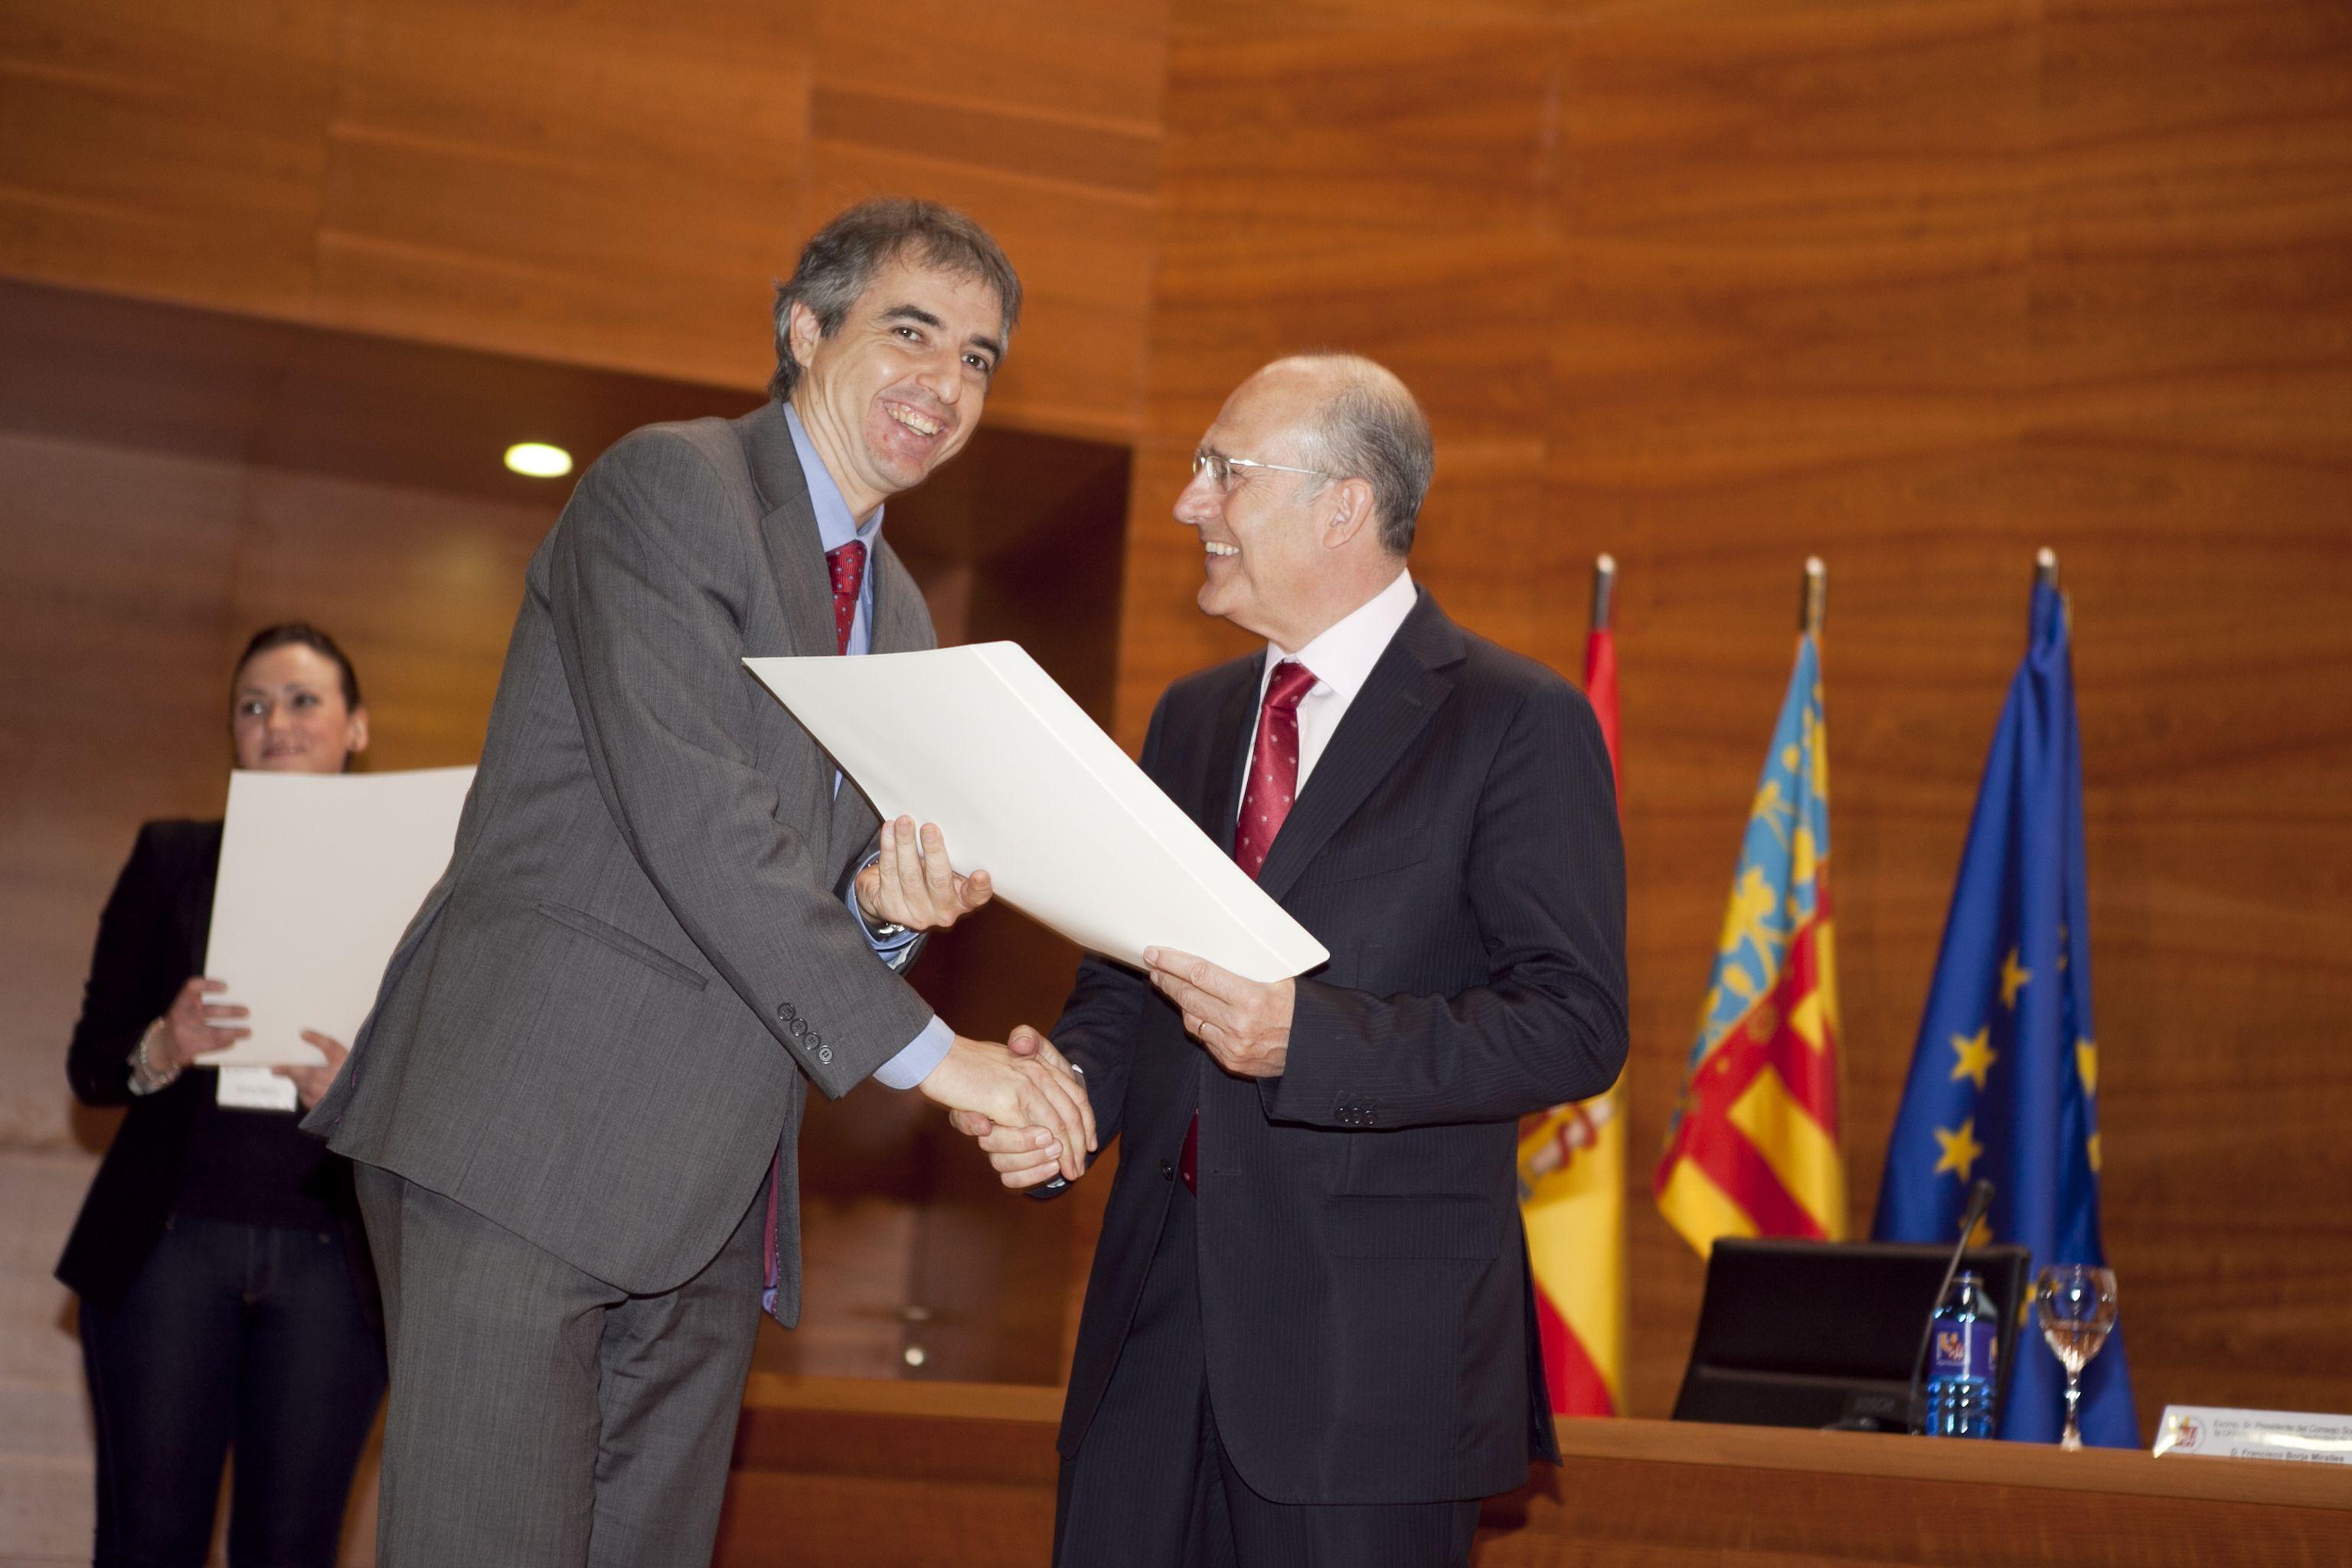 umh-diplomas-rector_mg_6806.jpg